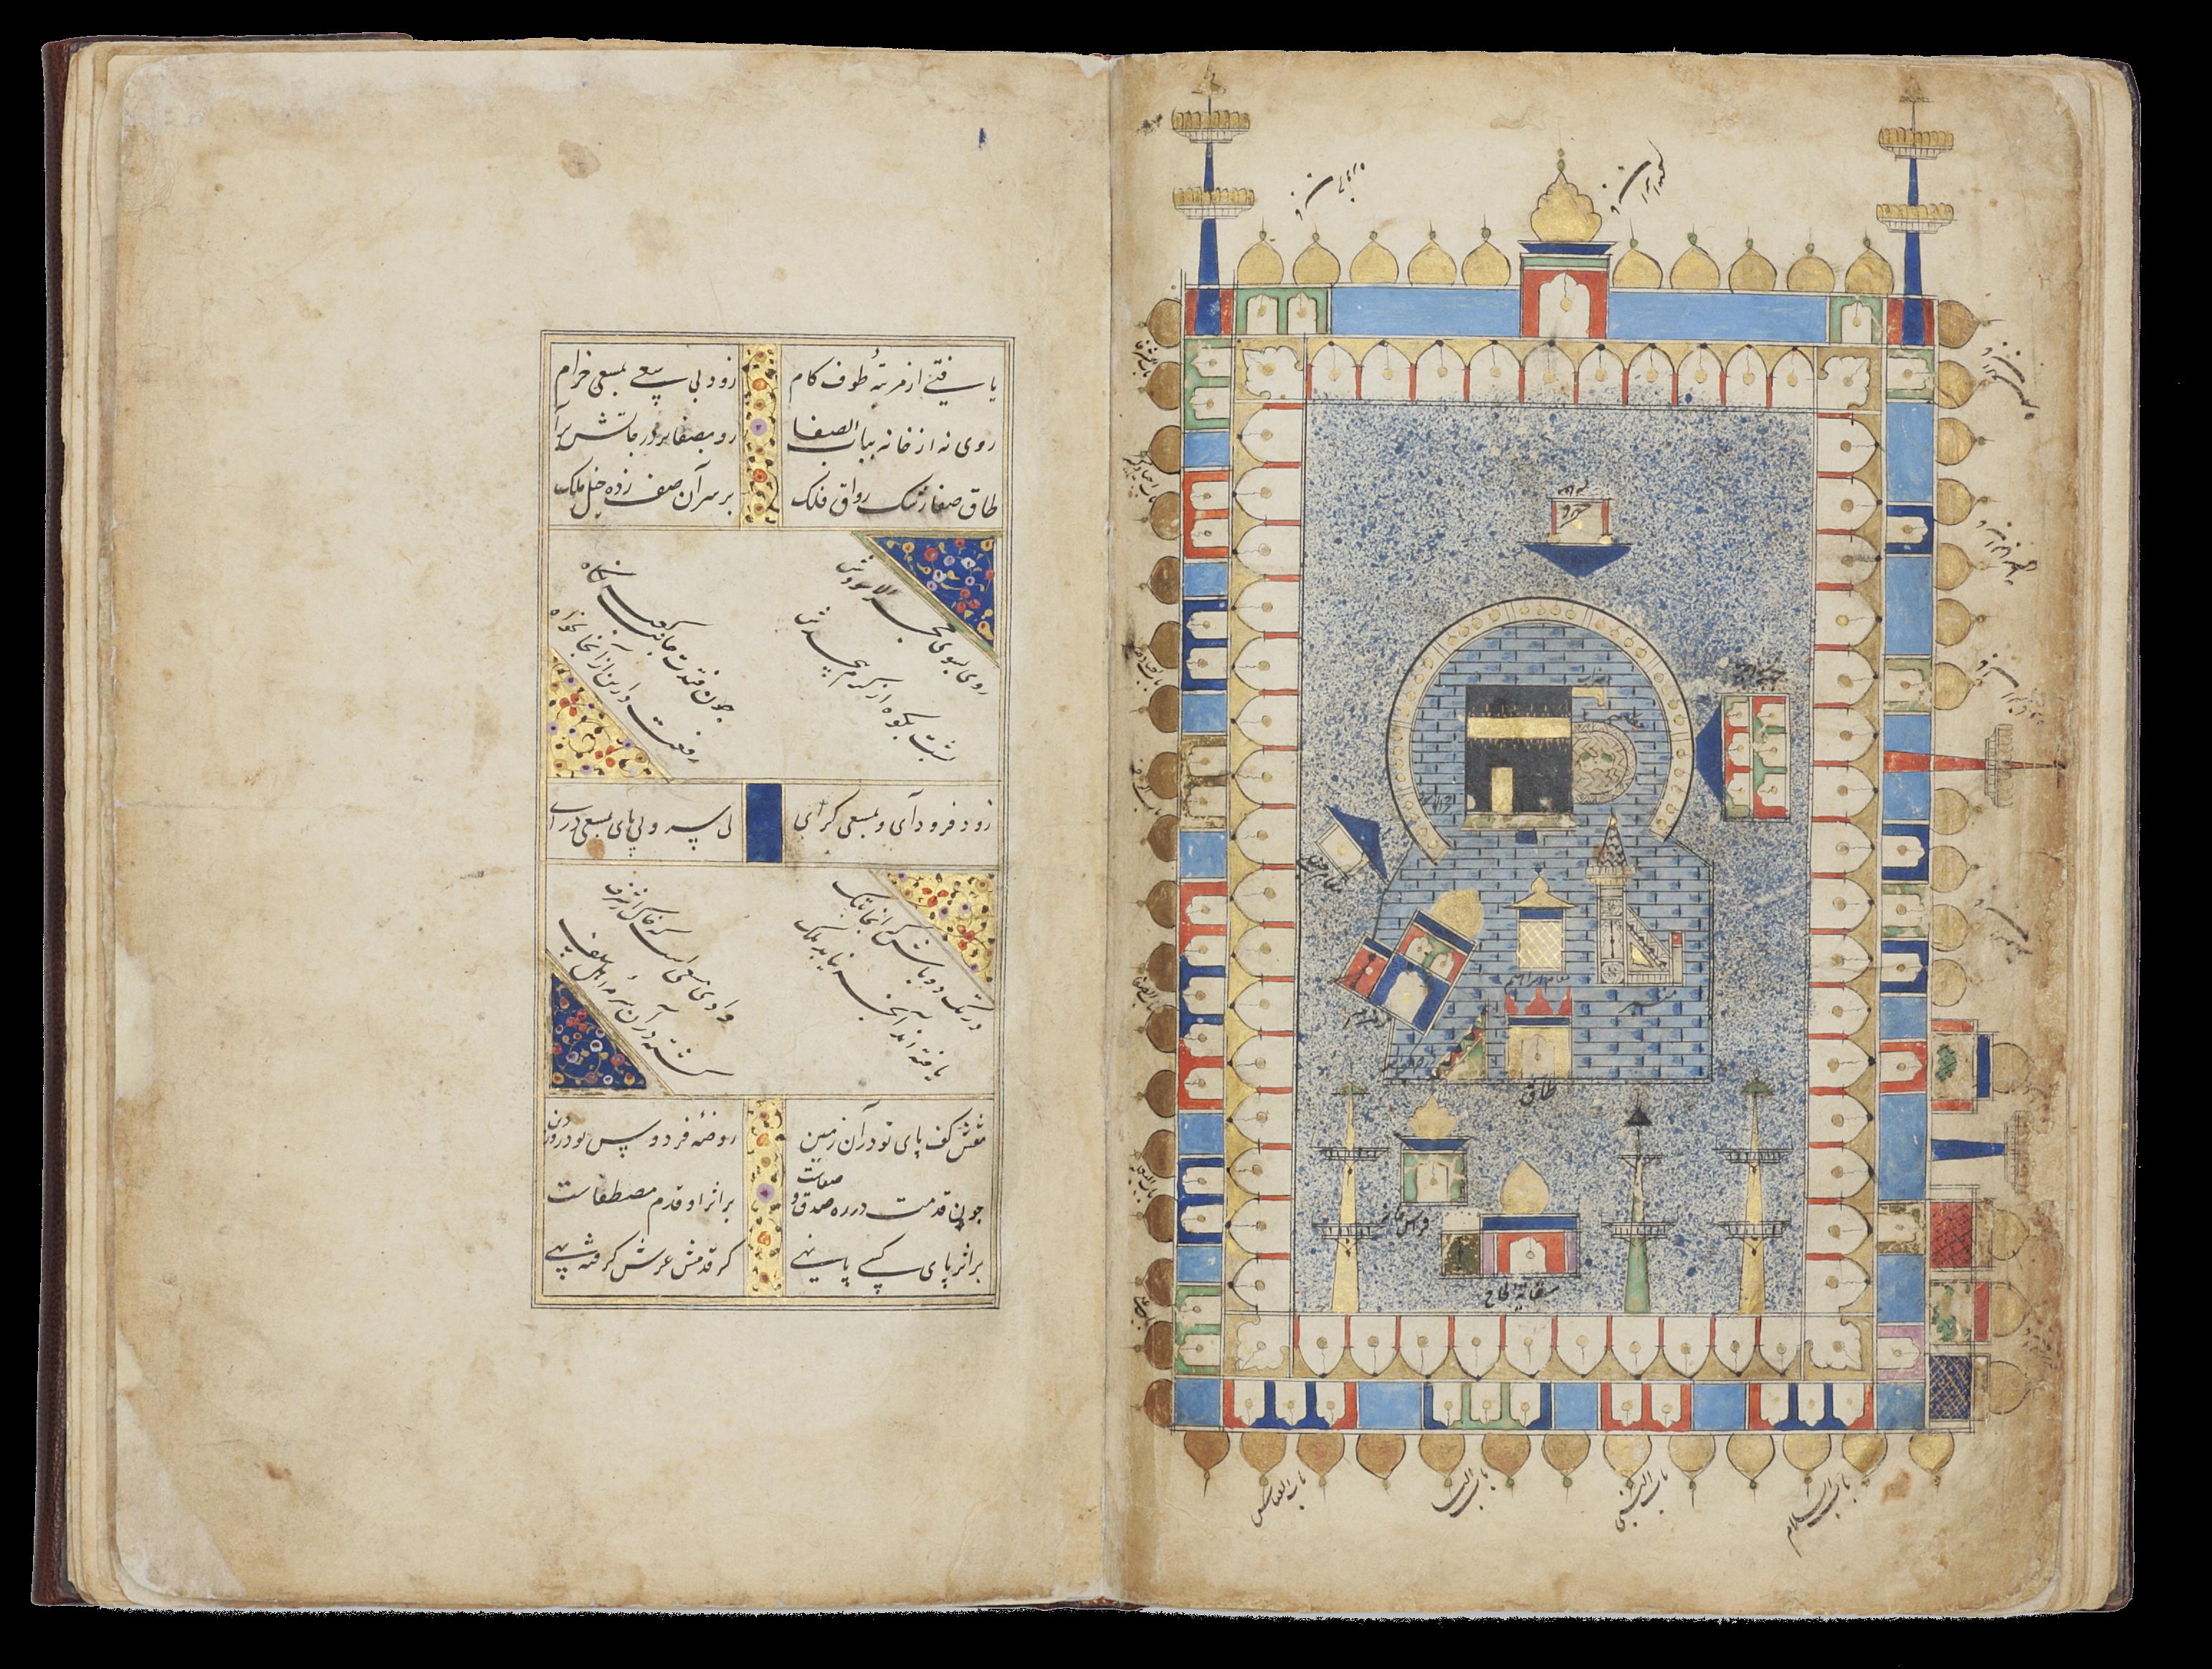 An illustrated copy of the Kitab futuh al-haramayn of Muhyi Lari